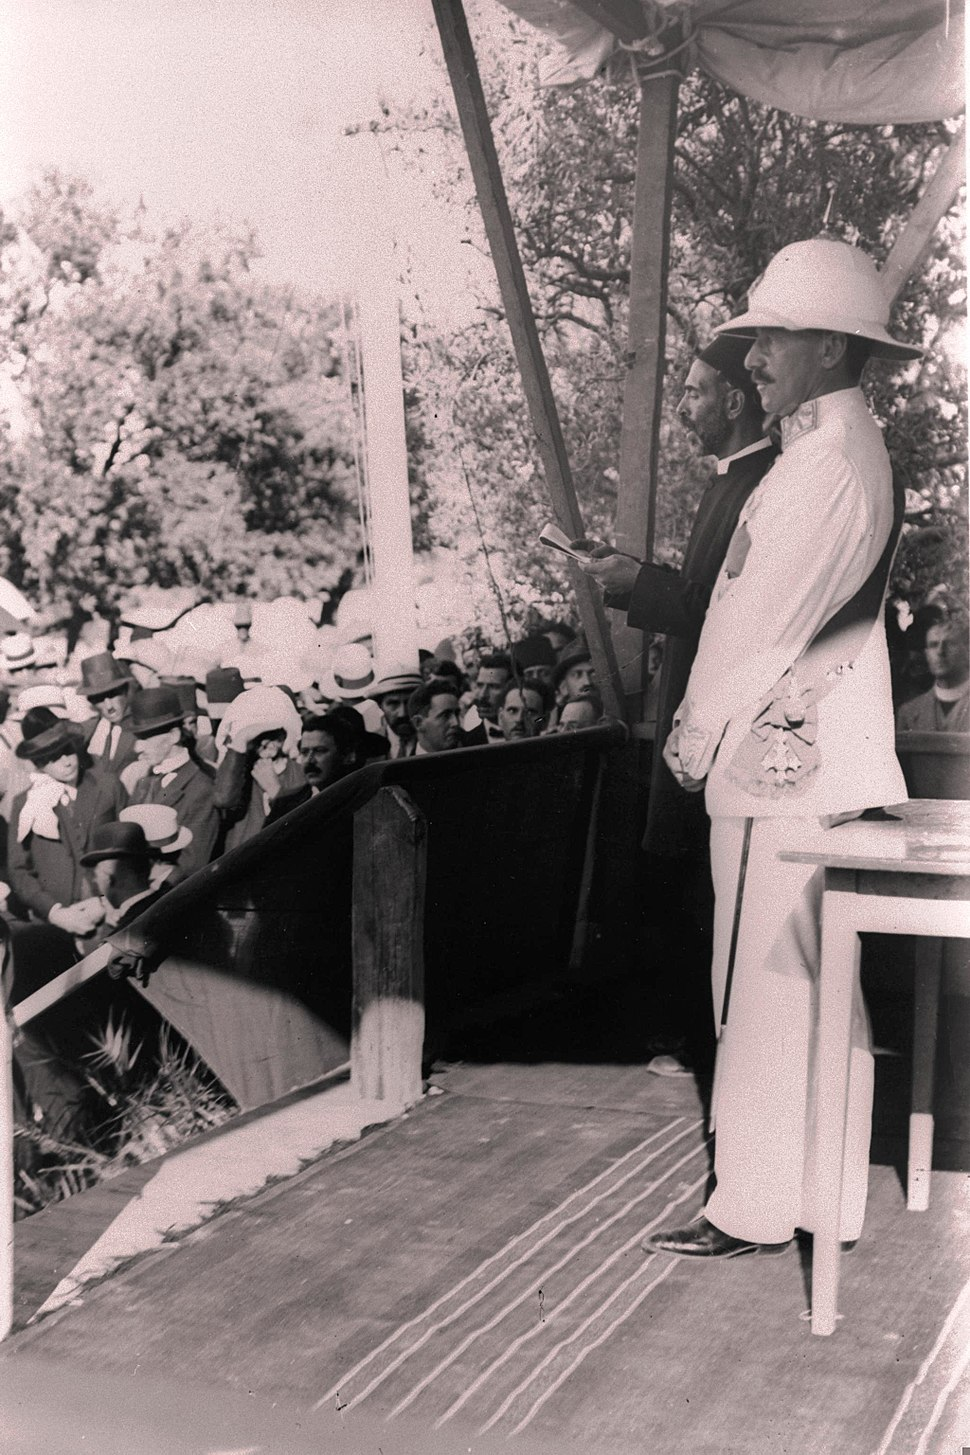 Herbert Samuel listening to the reading of the monarch's manifesto establishing civilian rule in the Land of Israel D220-105